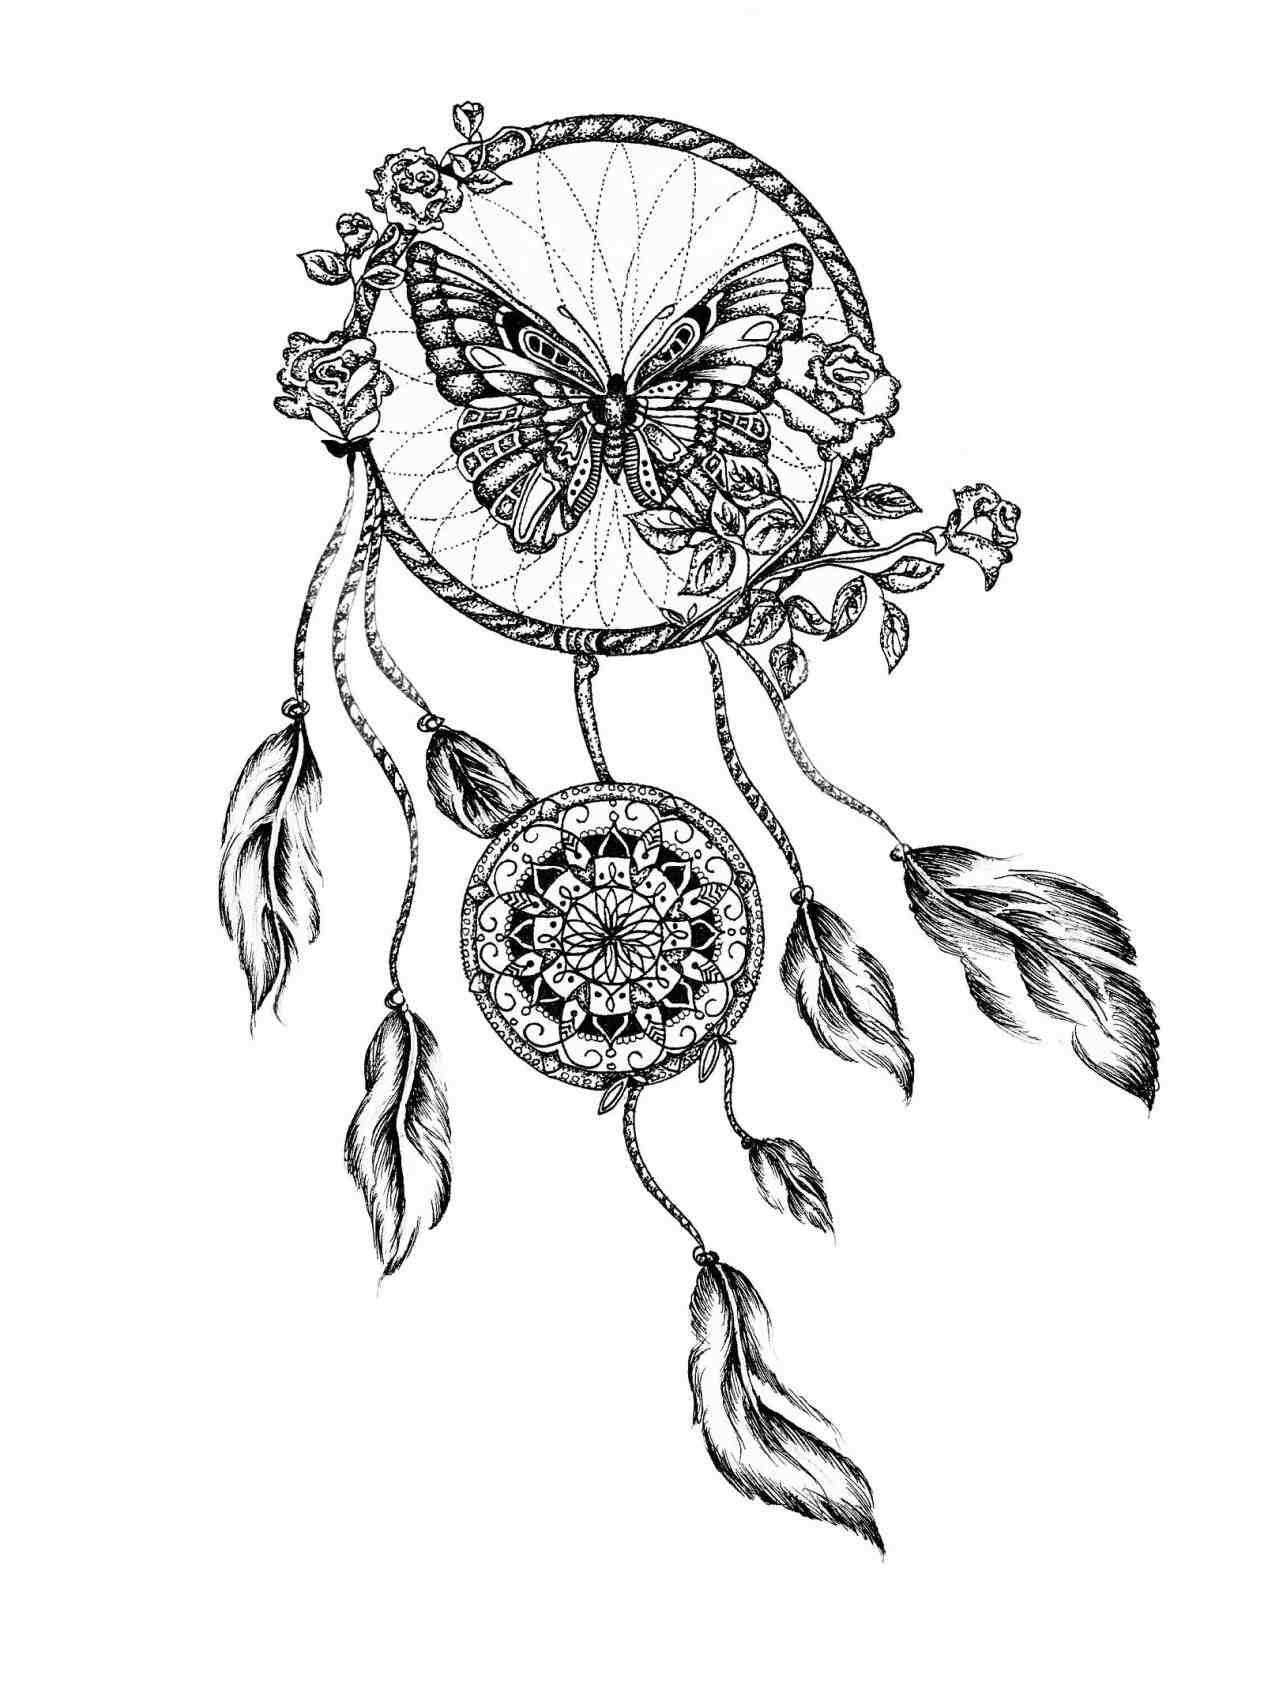 1264x1686 Beautiful Drawings Of Dream Catchers